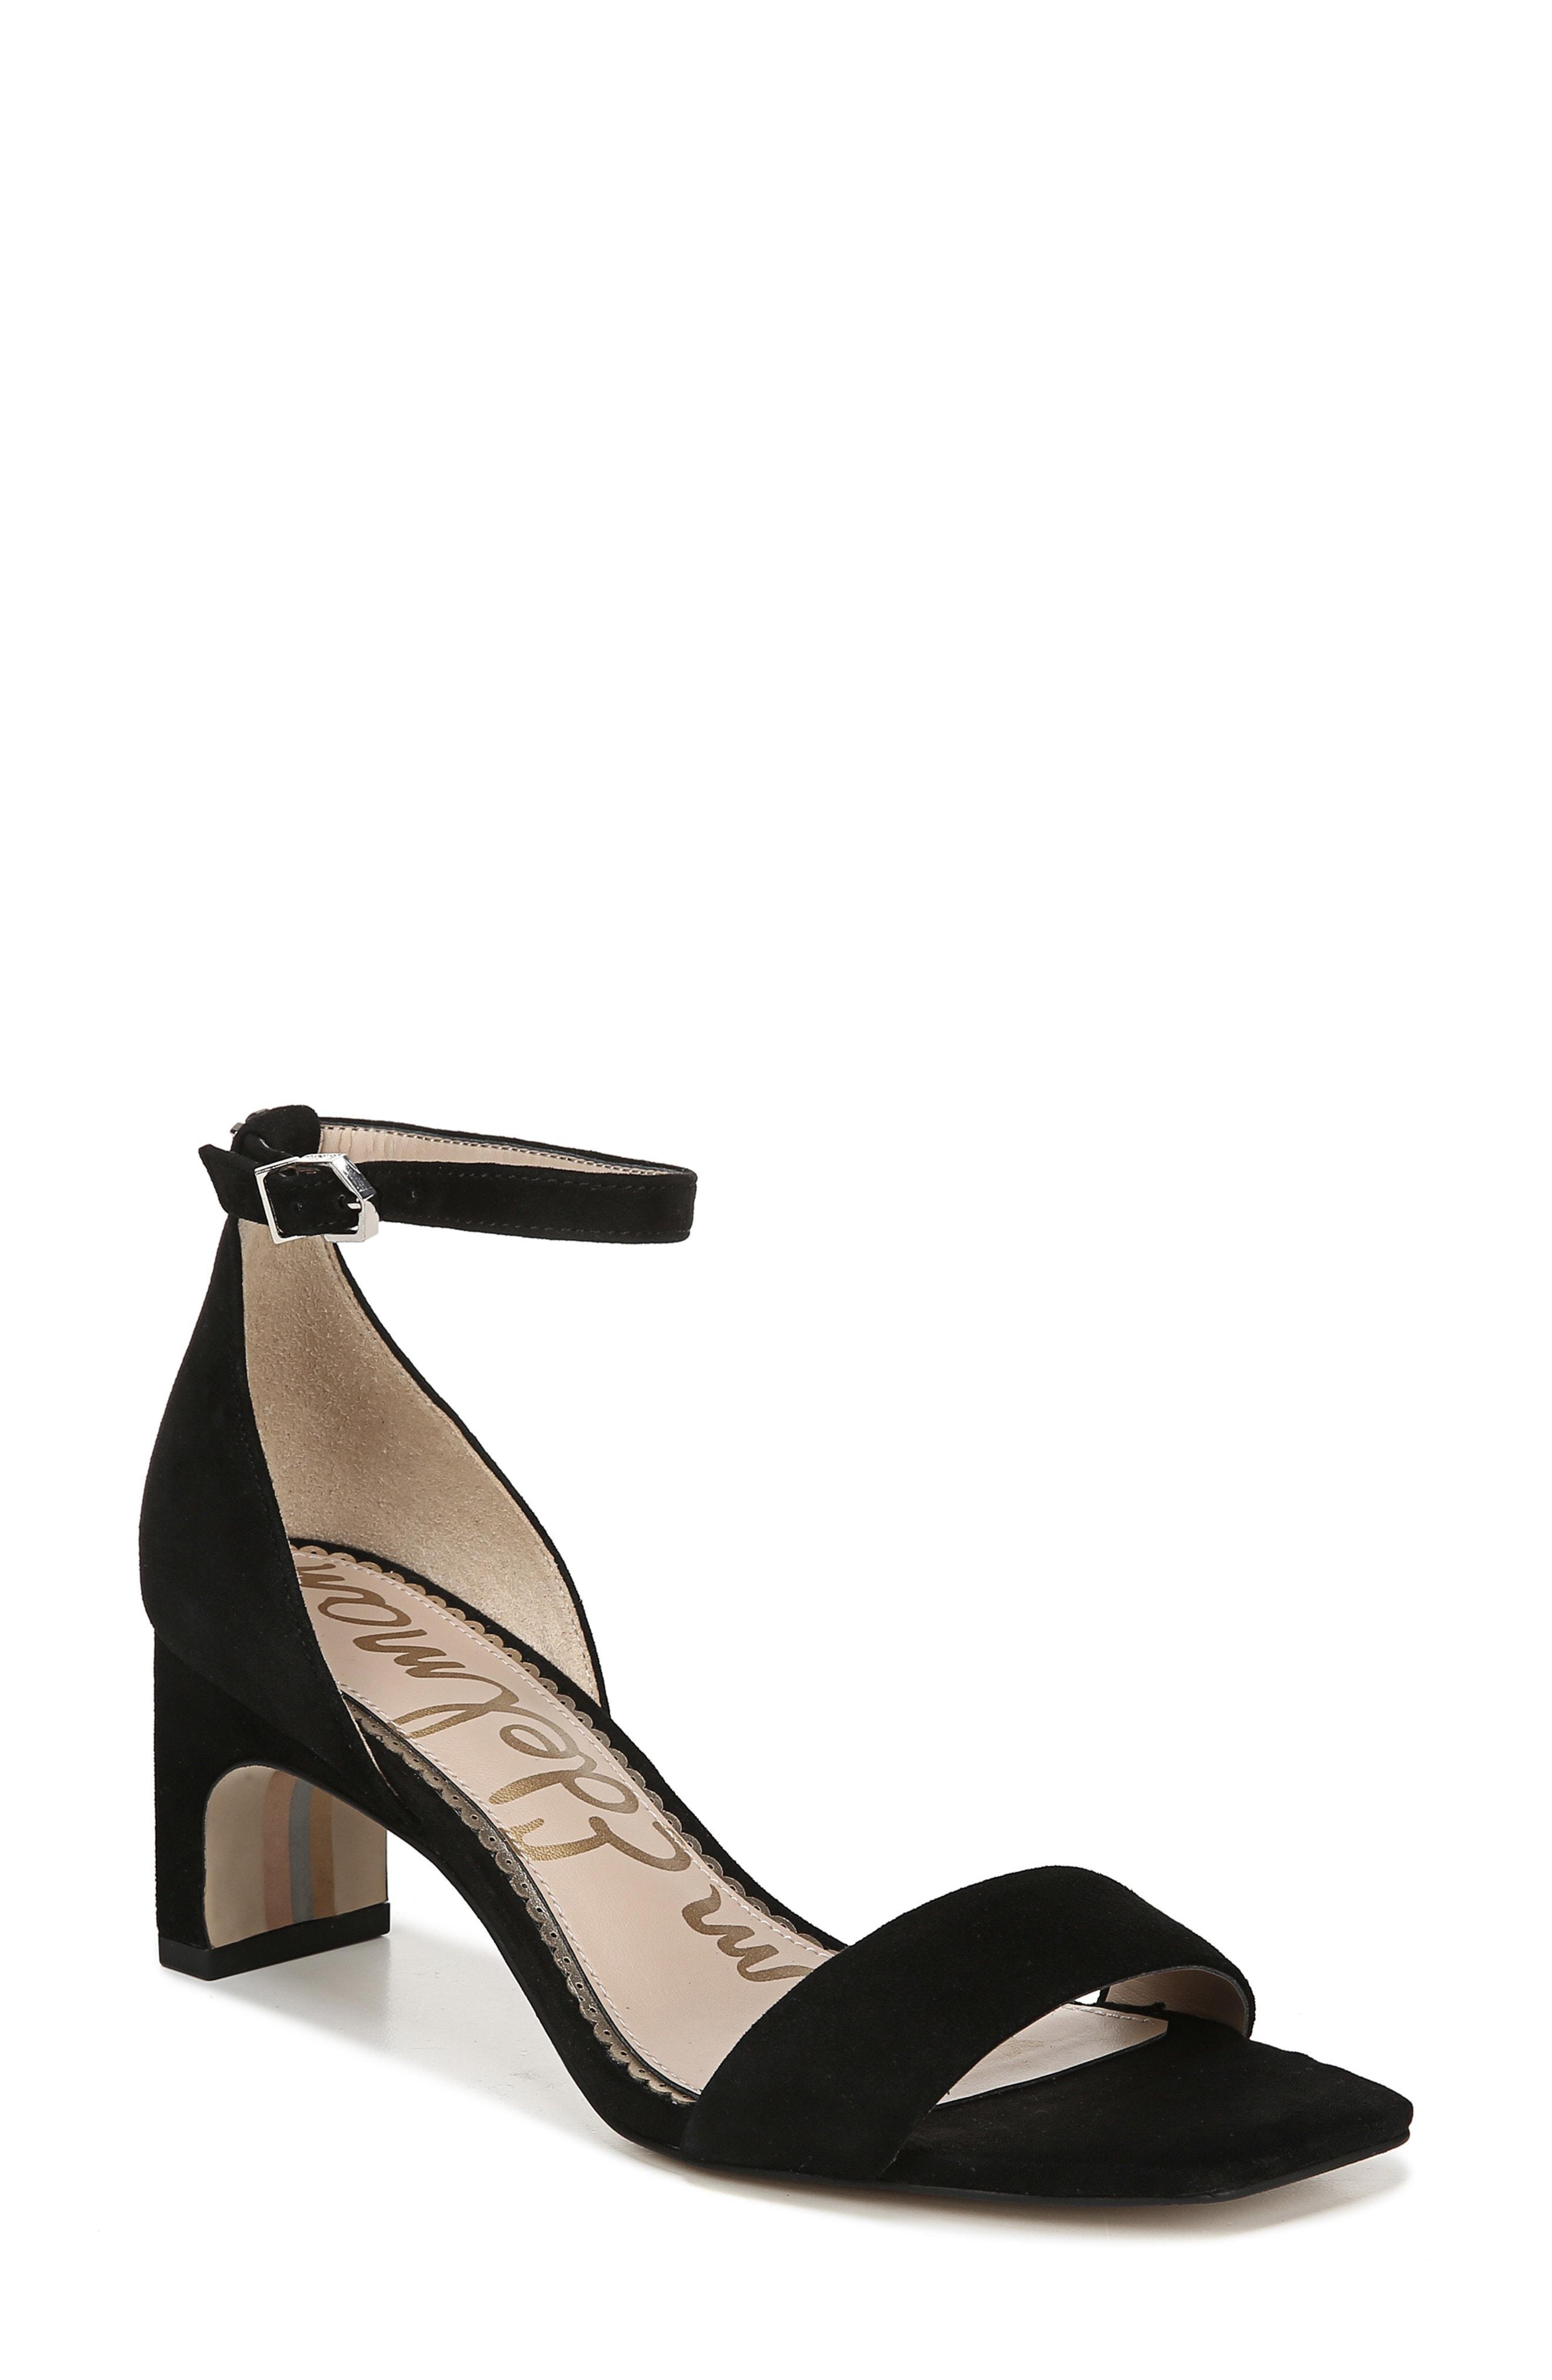 346fc69eb125 Lyst - Sam Edelman Holmes Ankle Strap Sandal in Black - Save 30%